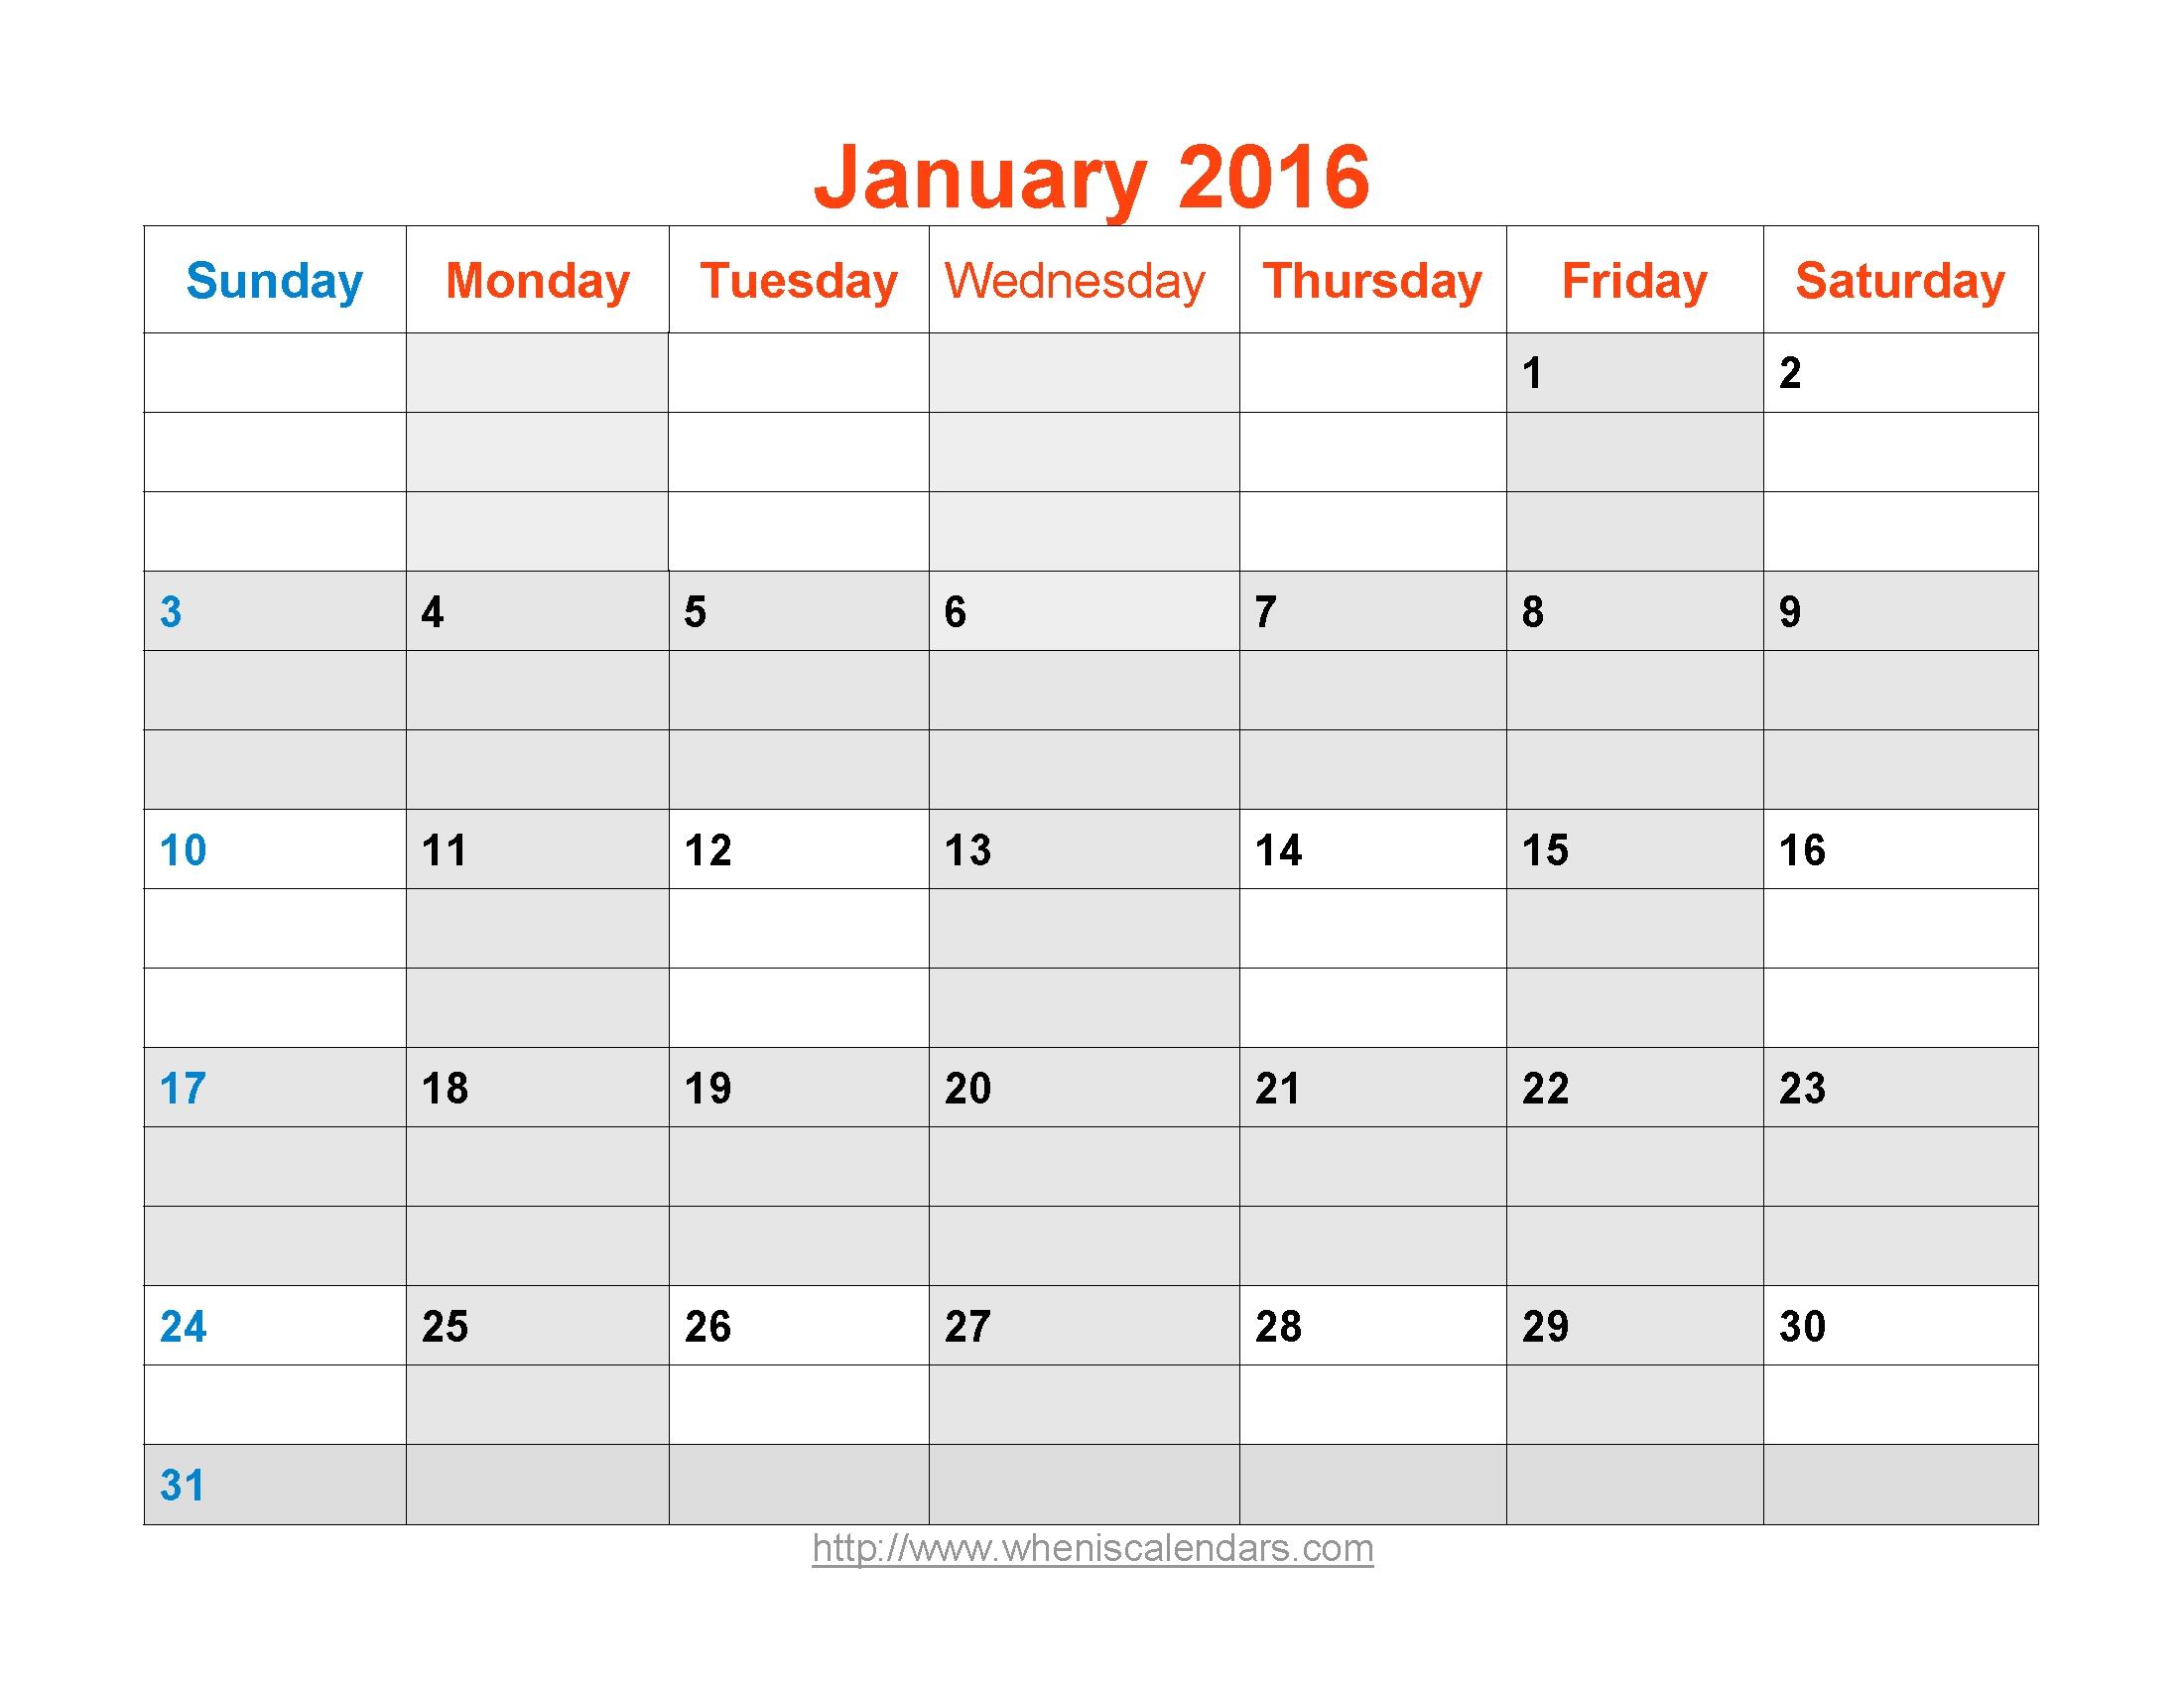 January 2016 Calendar Printable Template Word Pdf Image 89uj